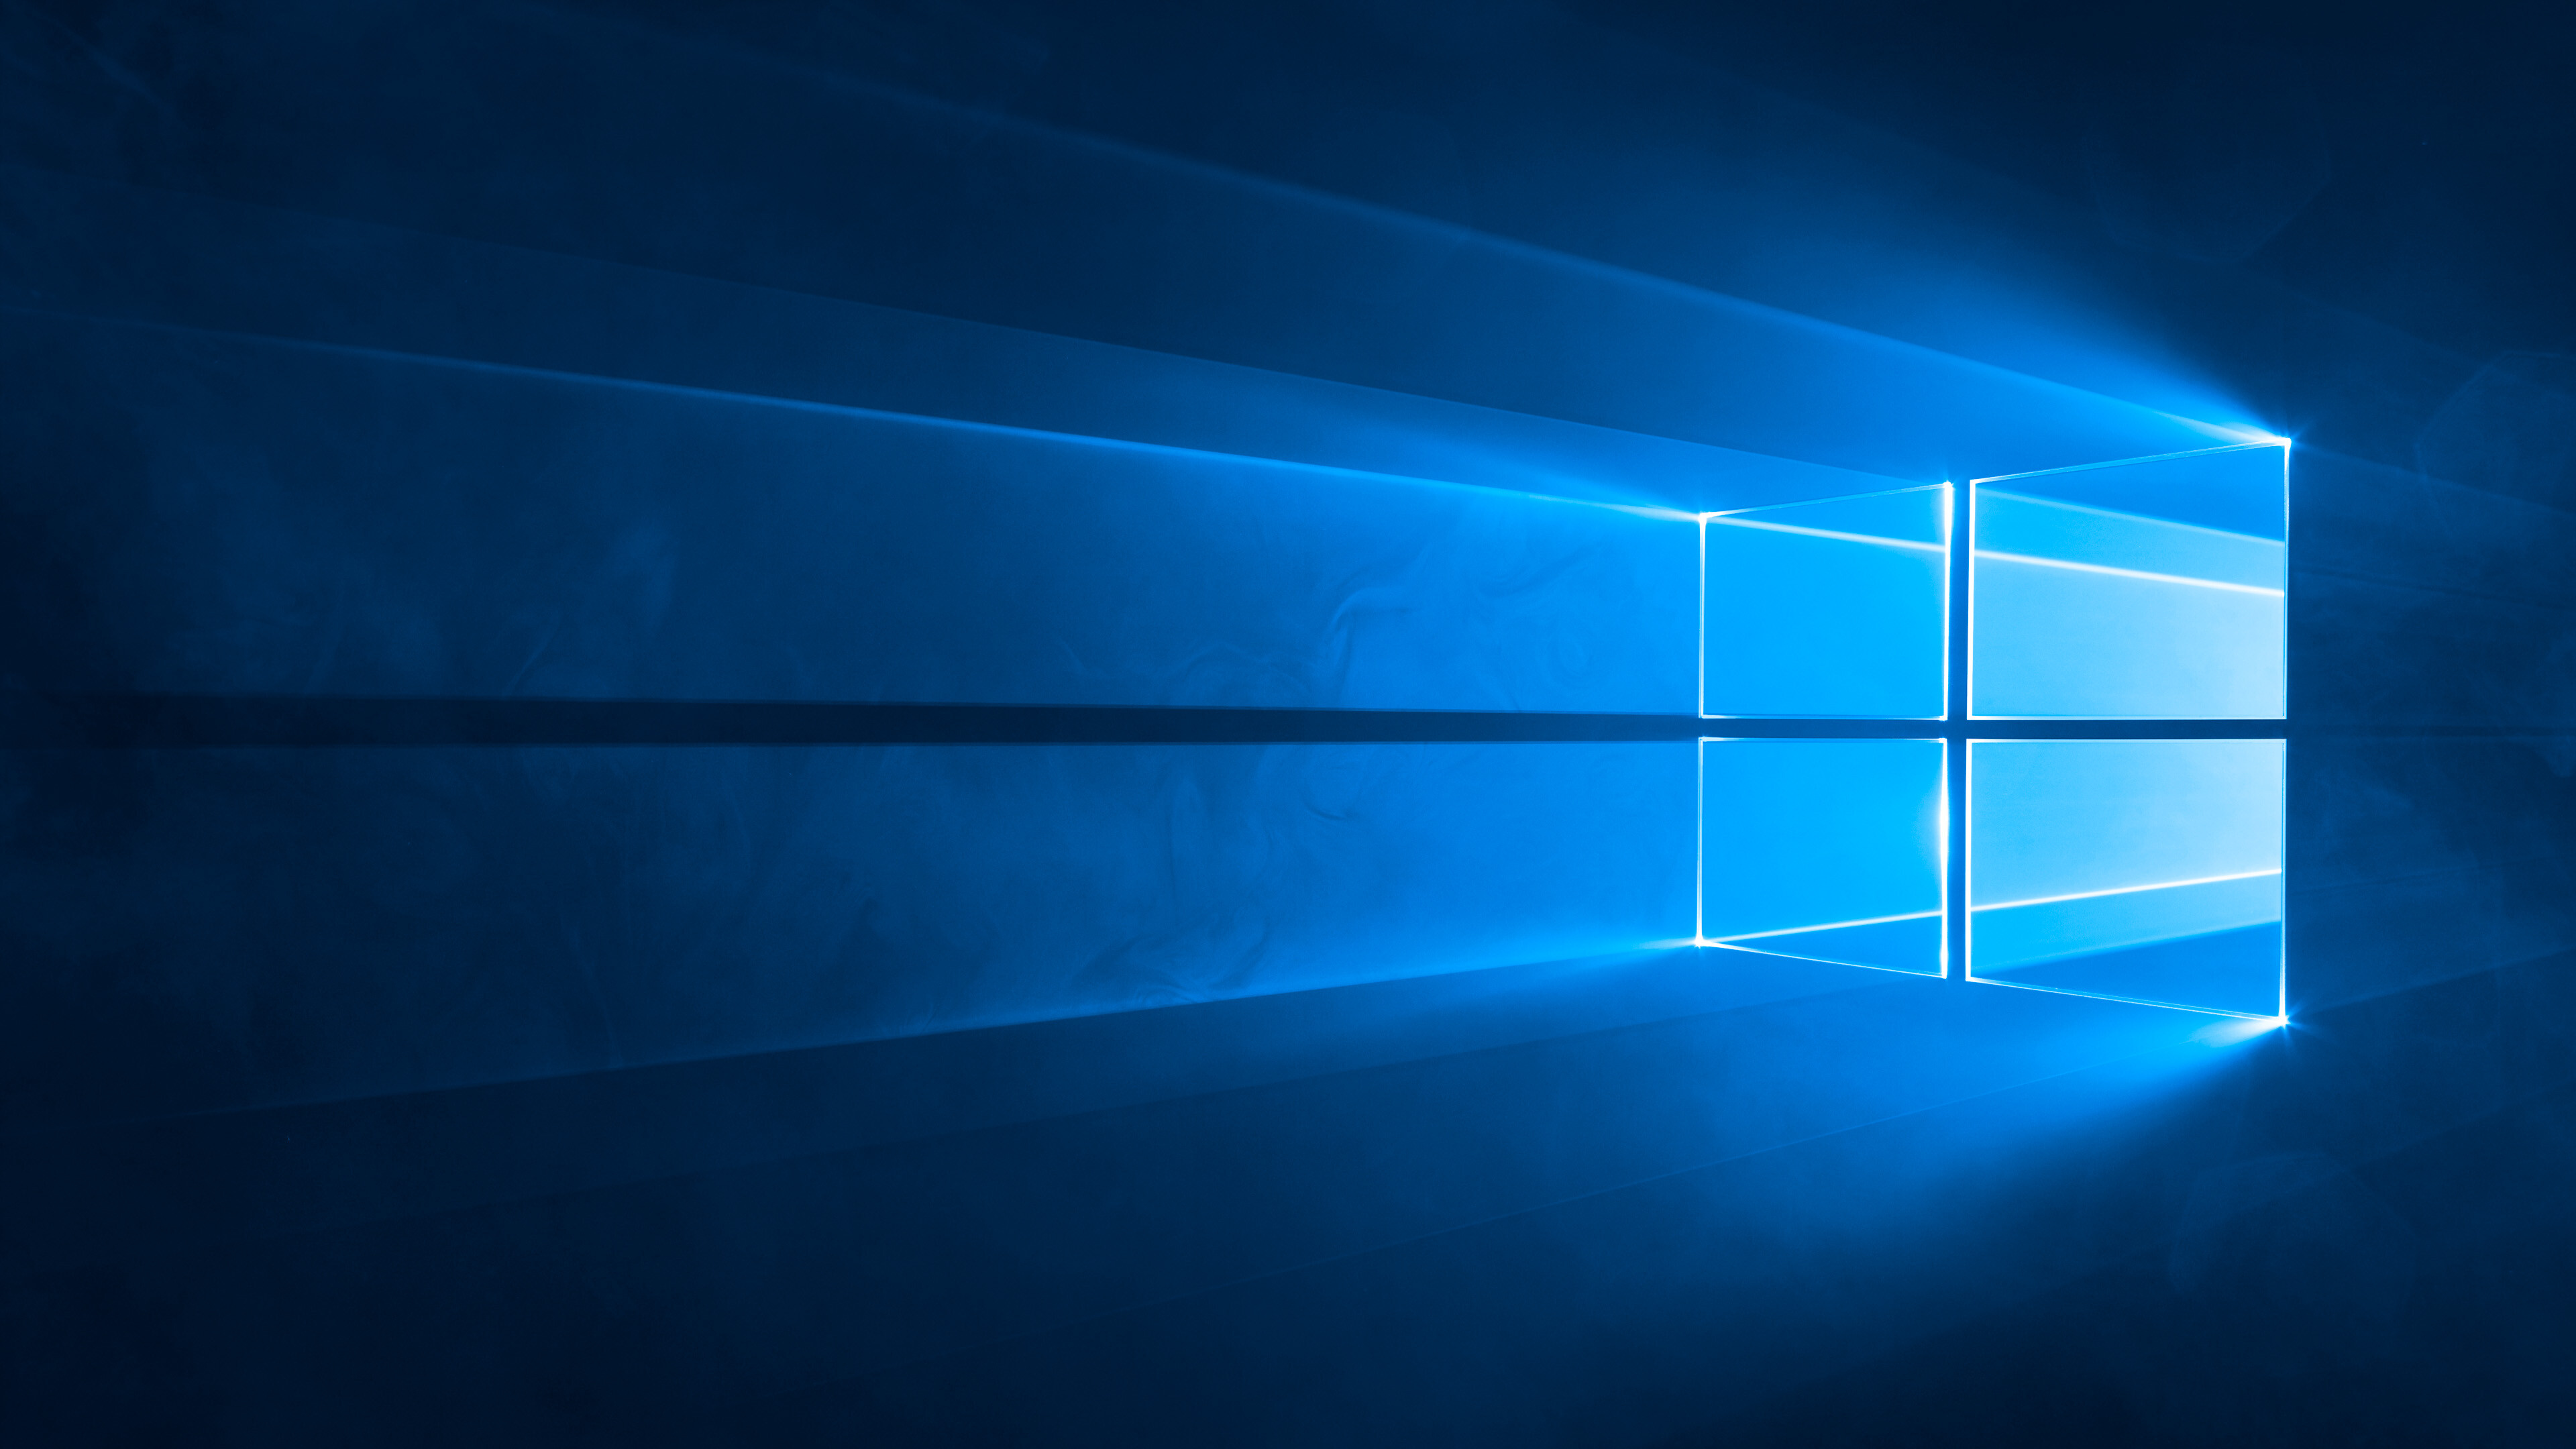 Windows 10 Wallpapers In 4K